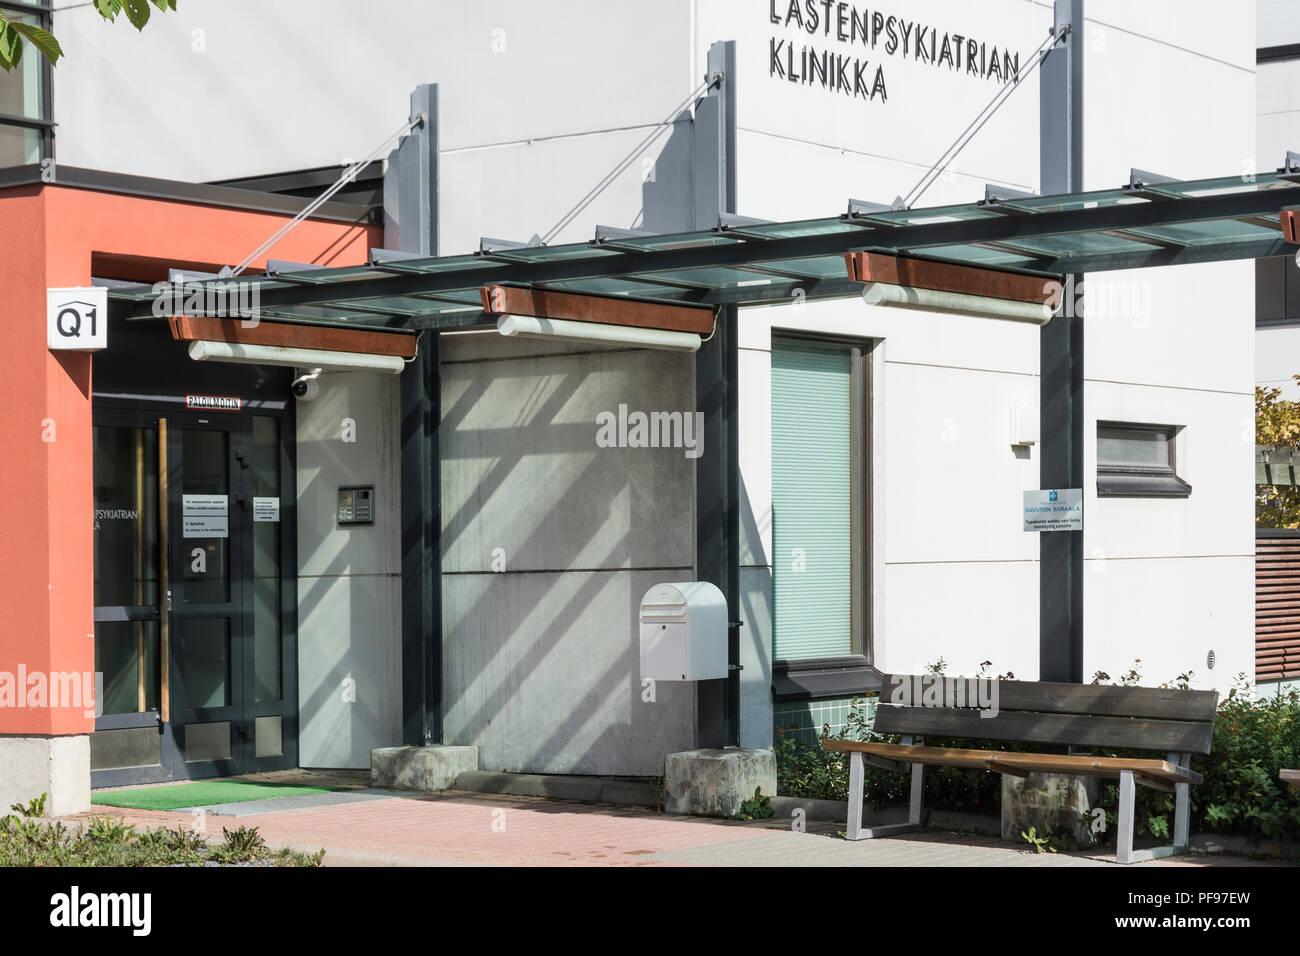 Tampere University Hospital in Tampere Finland - Stock Image